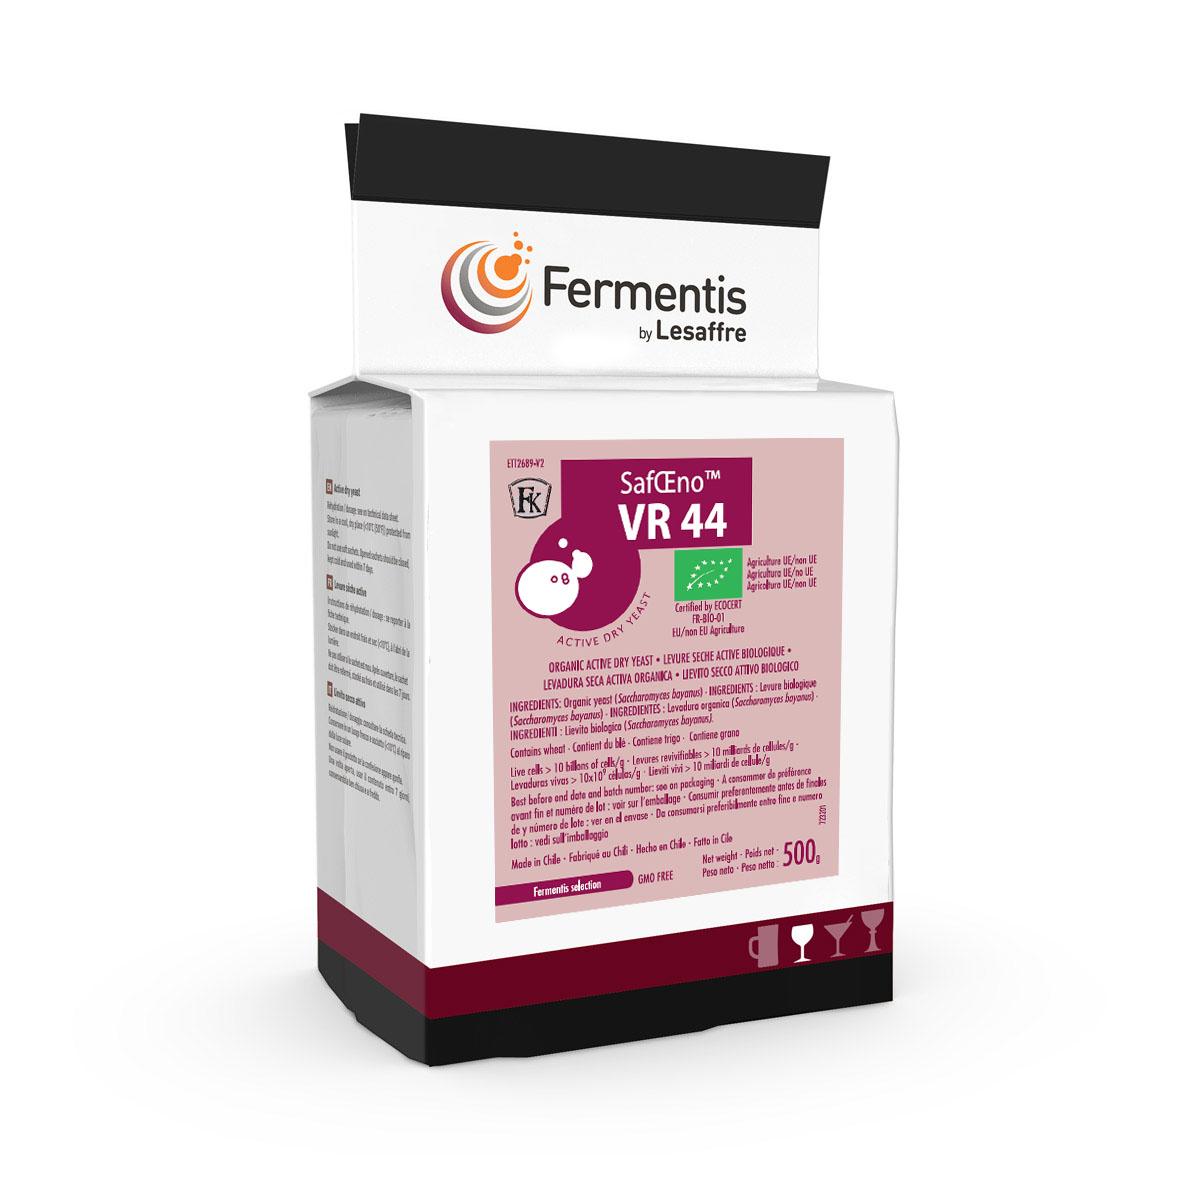 Safoeno VR 44 wine yeast pack by fermentis